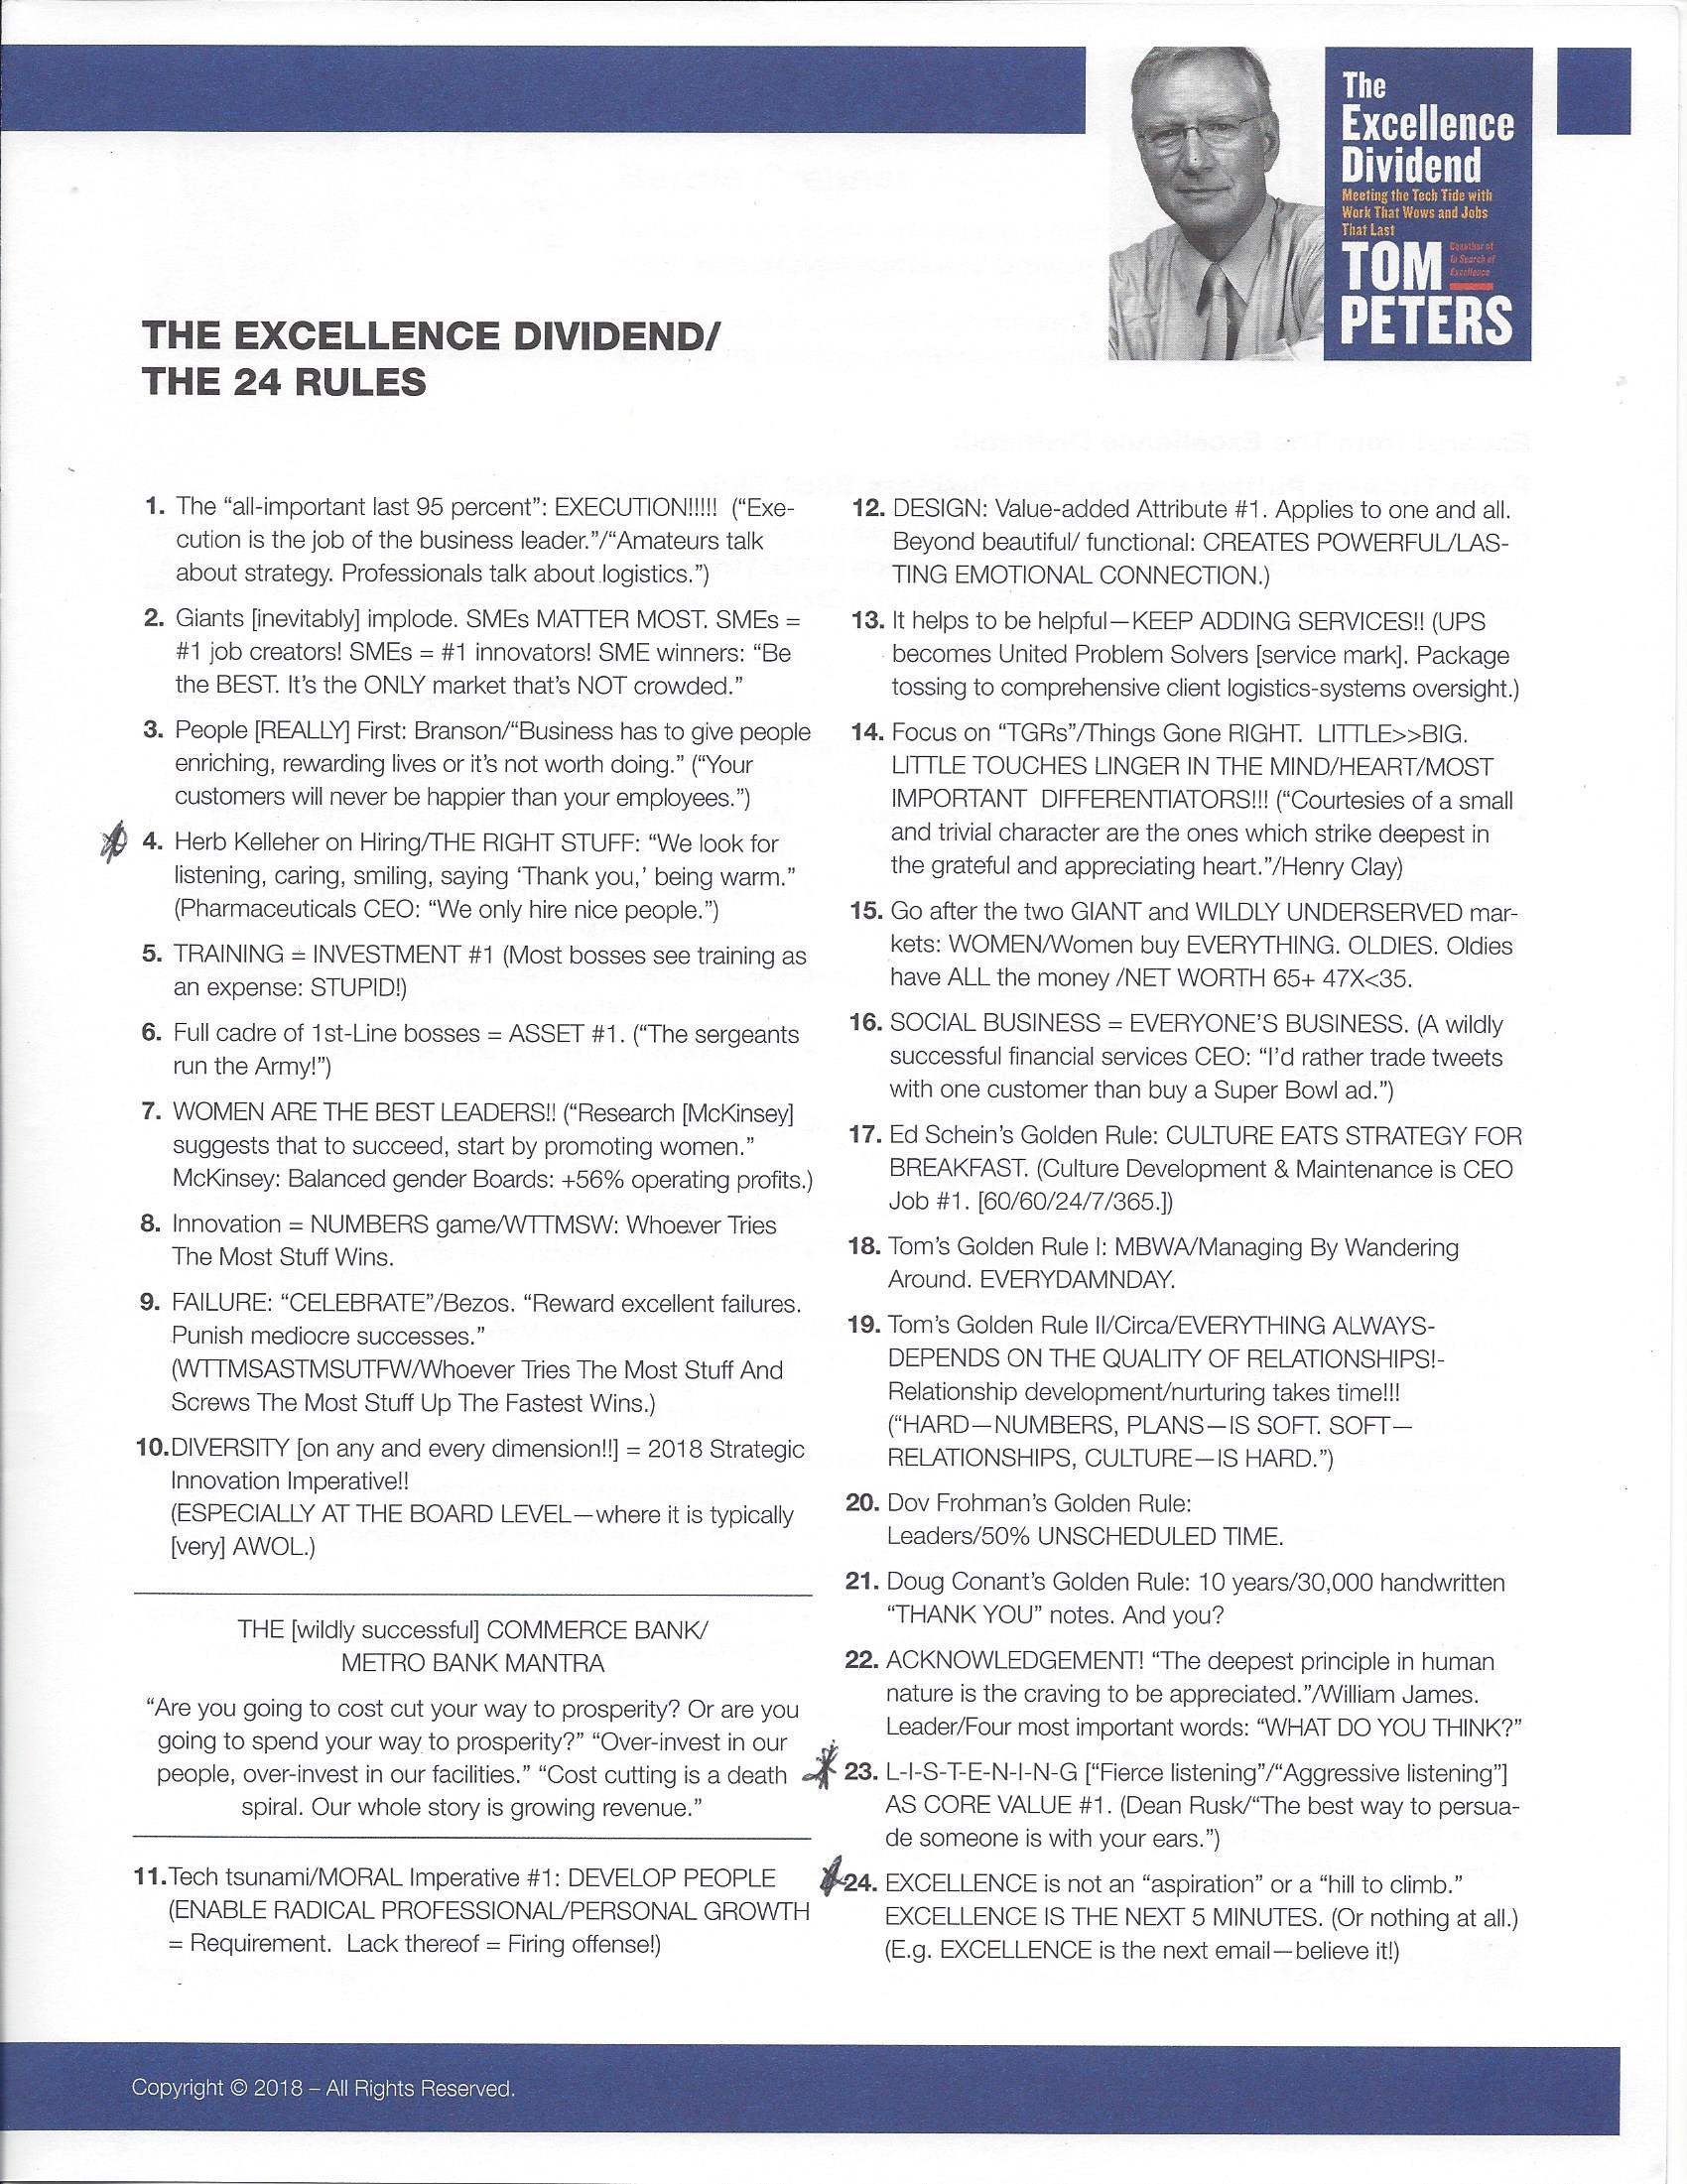 Tom Peters NOLA ScaleUp Summit - 24 Rules